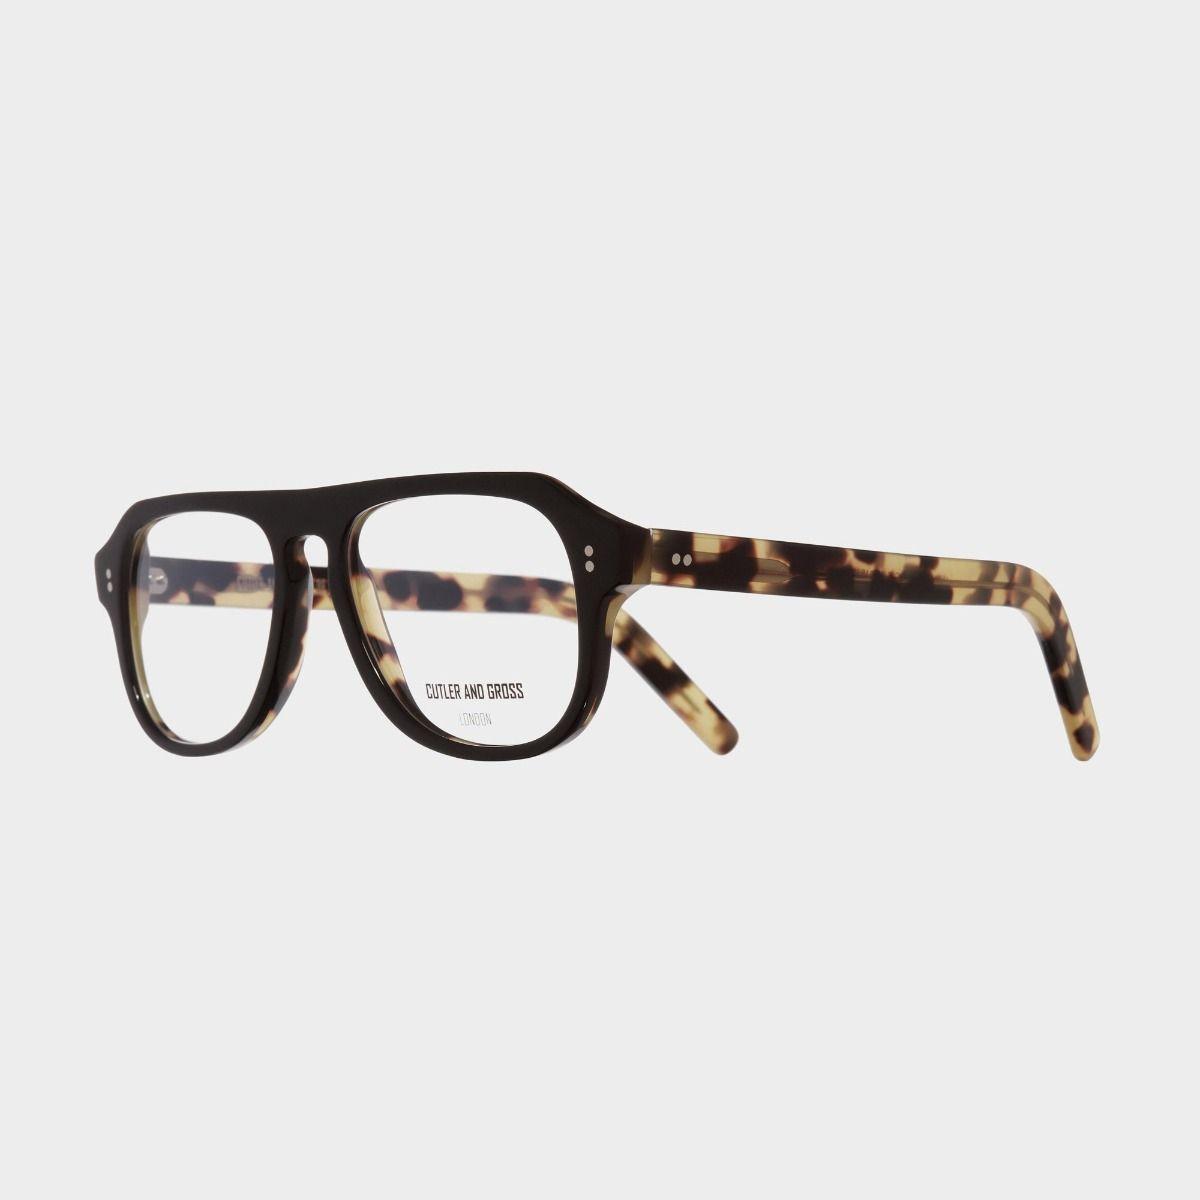 0822V3 Optical Aviator Glasses (Large)